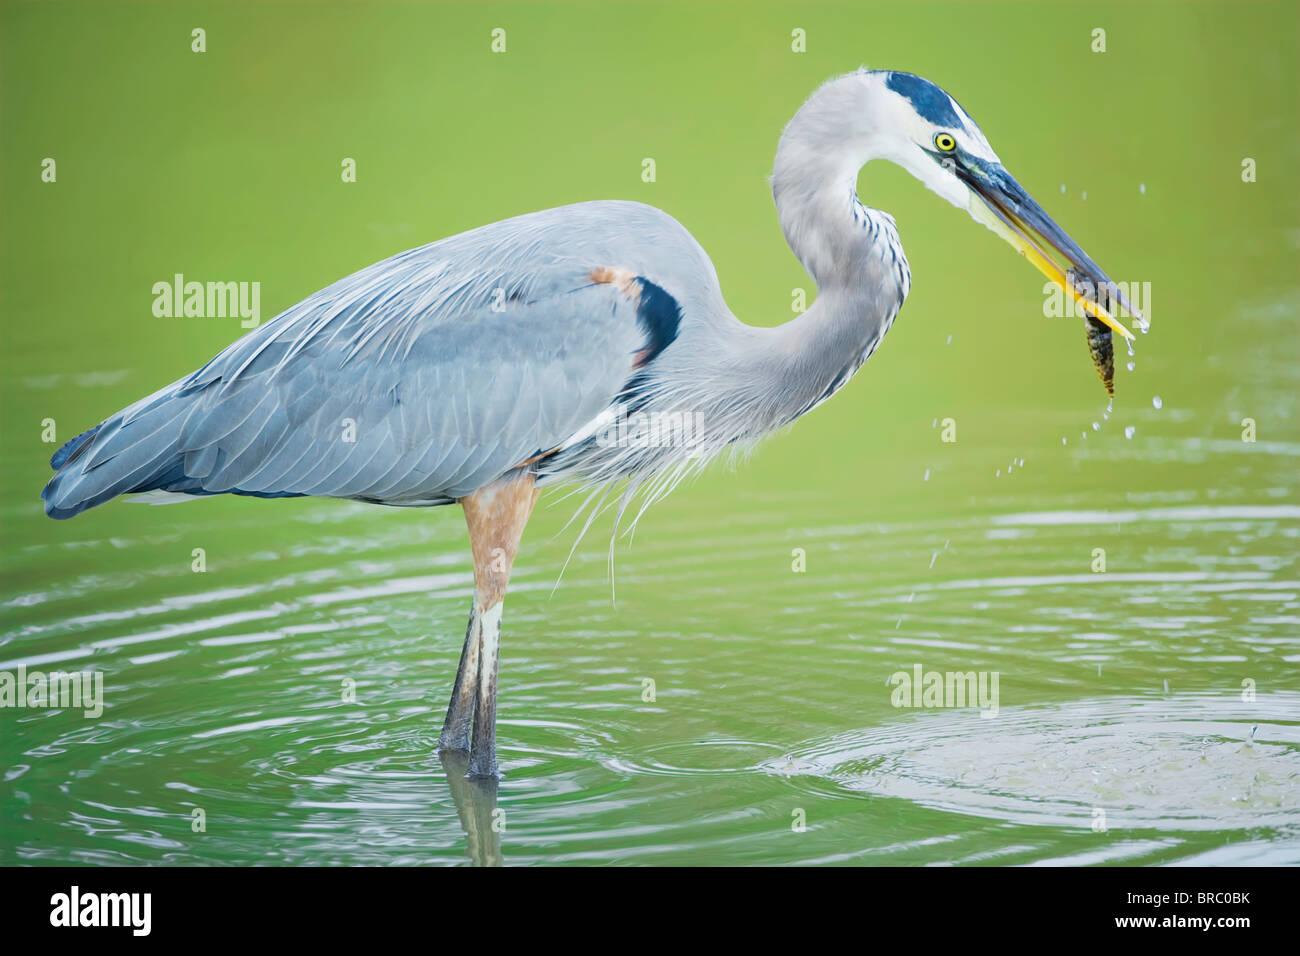 Great blue heron with fish, standing in water, Sanibel Island, J. N. Ding Darling National Wildlife Refuge, Florida, - Stock Image